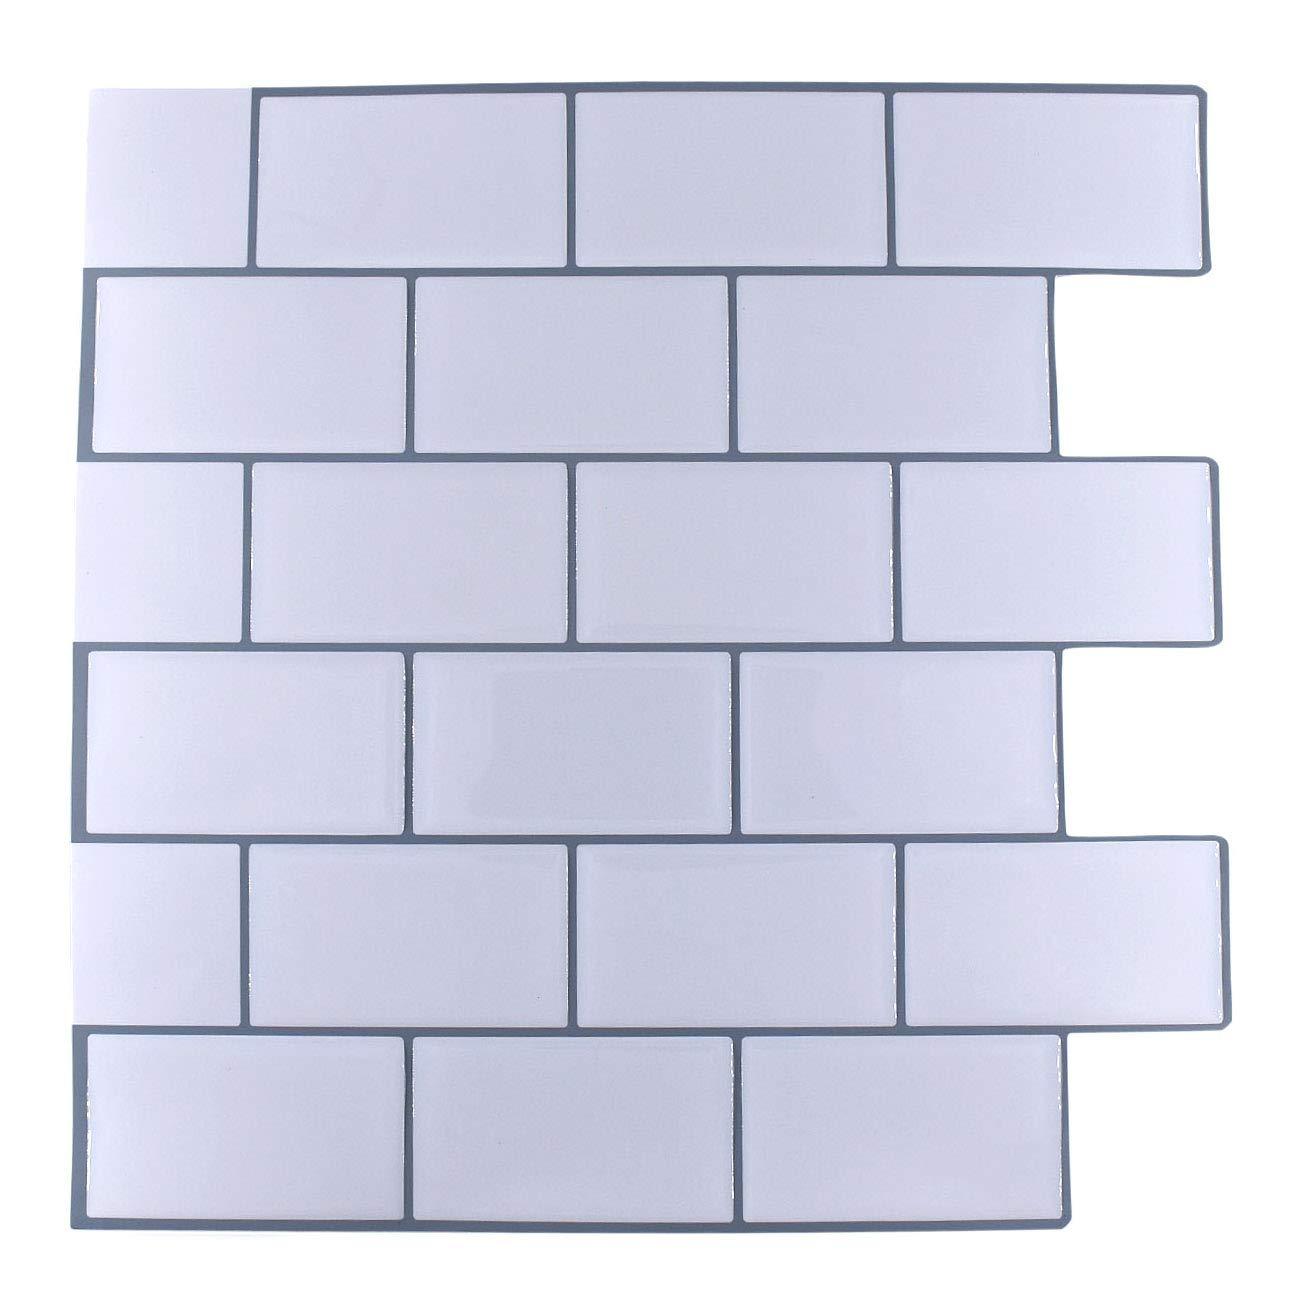 "Peel and Stick Subway Tile Backsplash,HONJAN Renters Groutless Removable Adhesive White Vinyl Backsplash for Kitchen Bathroom 10""x10"" Pack of 5 (A)"